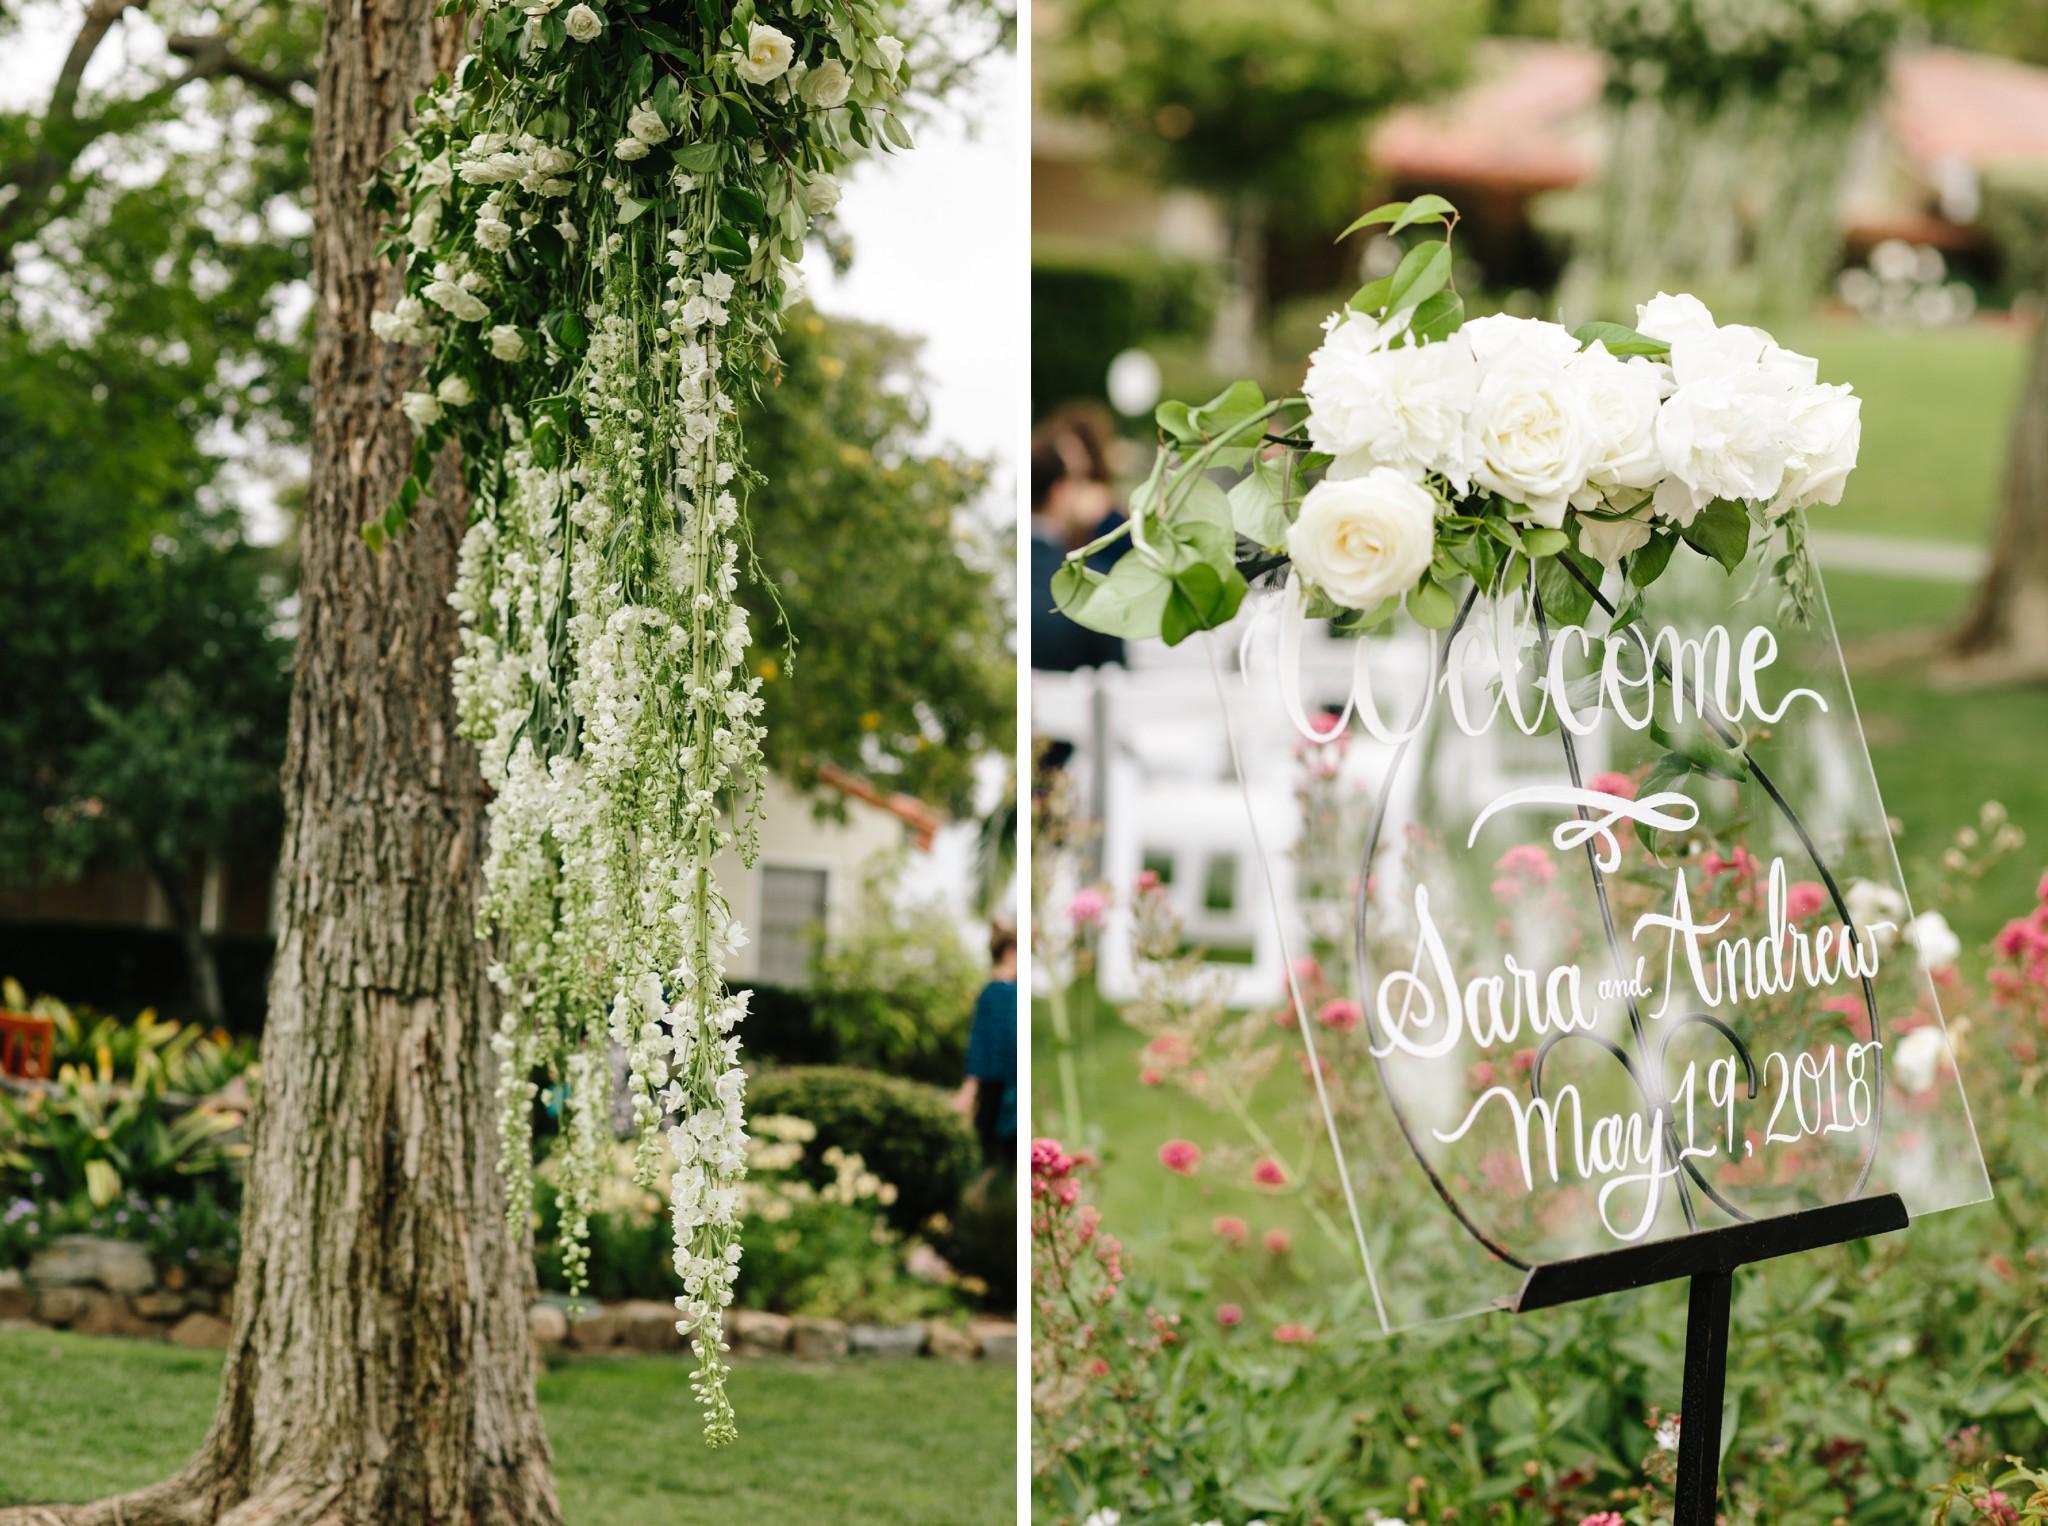 127 THEDELAURAS_THE_INN_AT_RANCHO_SANTA_FE_WEDDING_CEREMONY FLOWERS_BLOG127.jpg